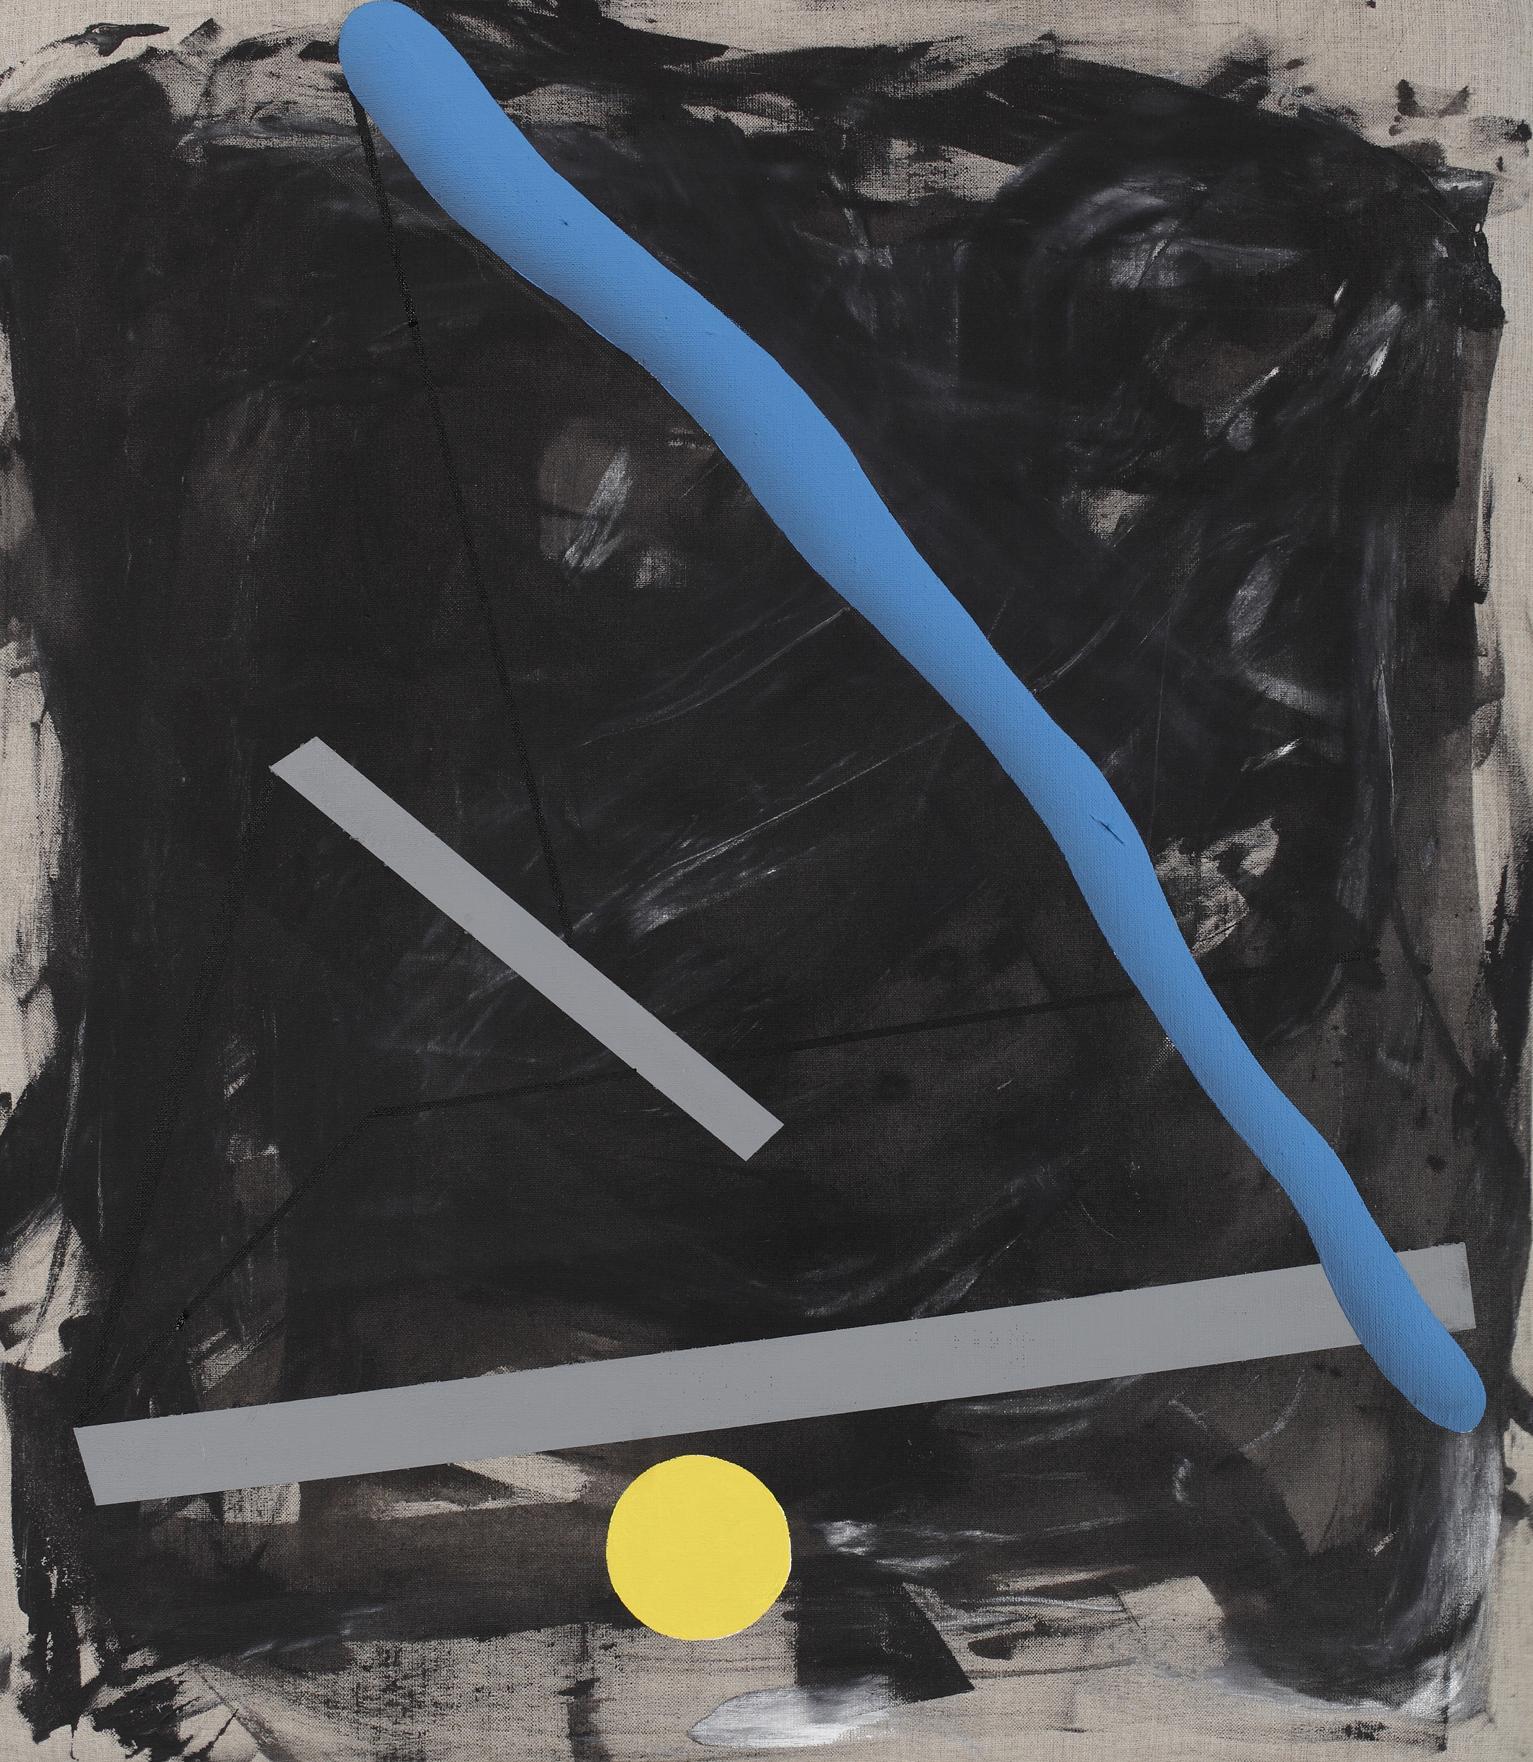 Construction No.1, 2011, acrylic on canvas, 80 x 70 cm